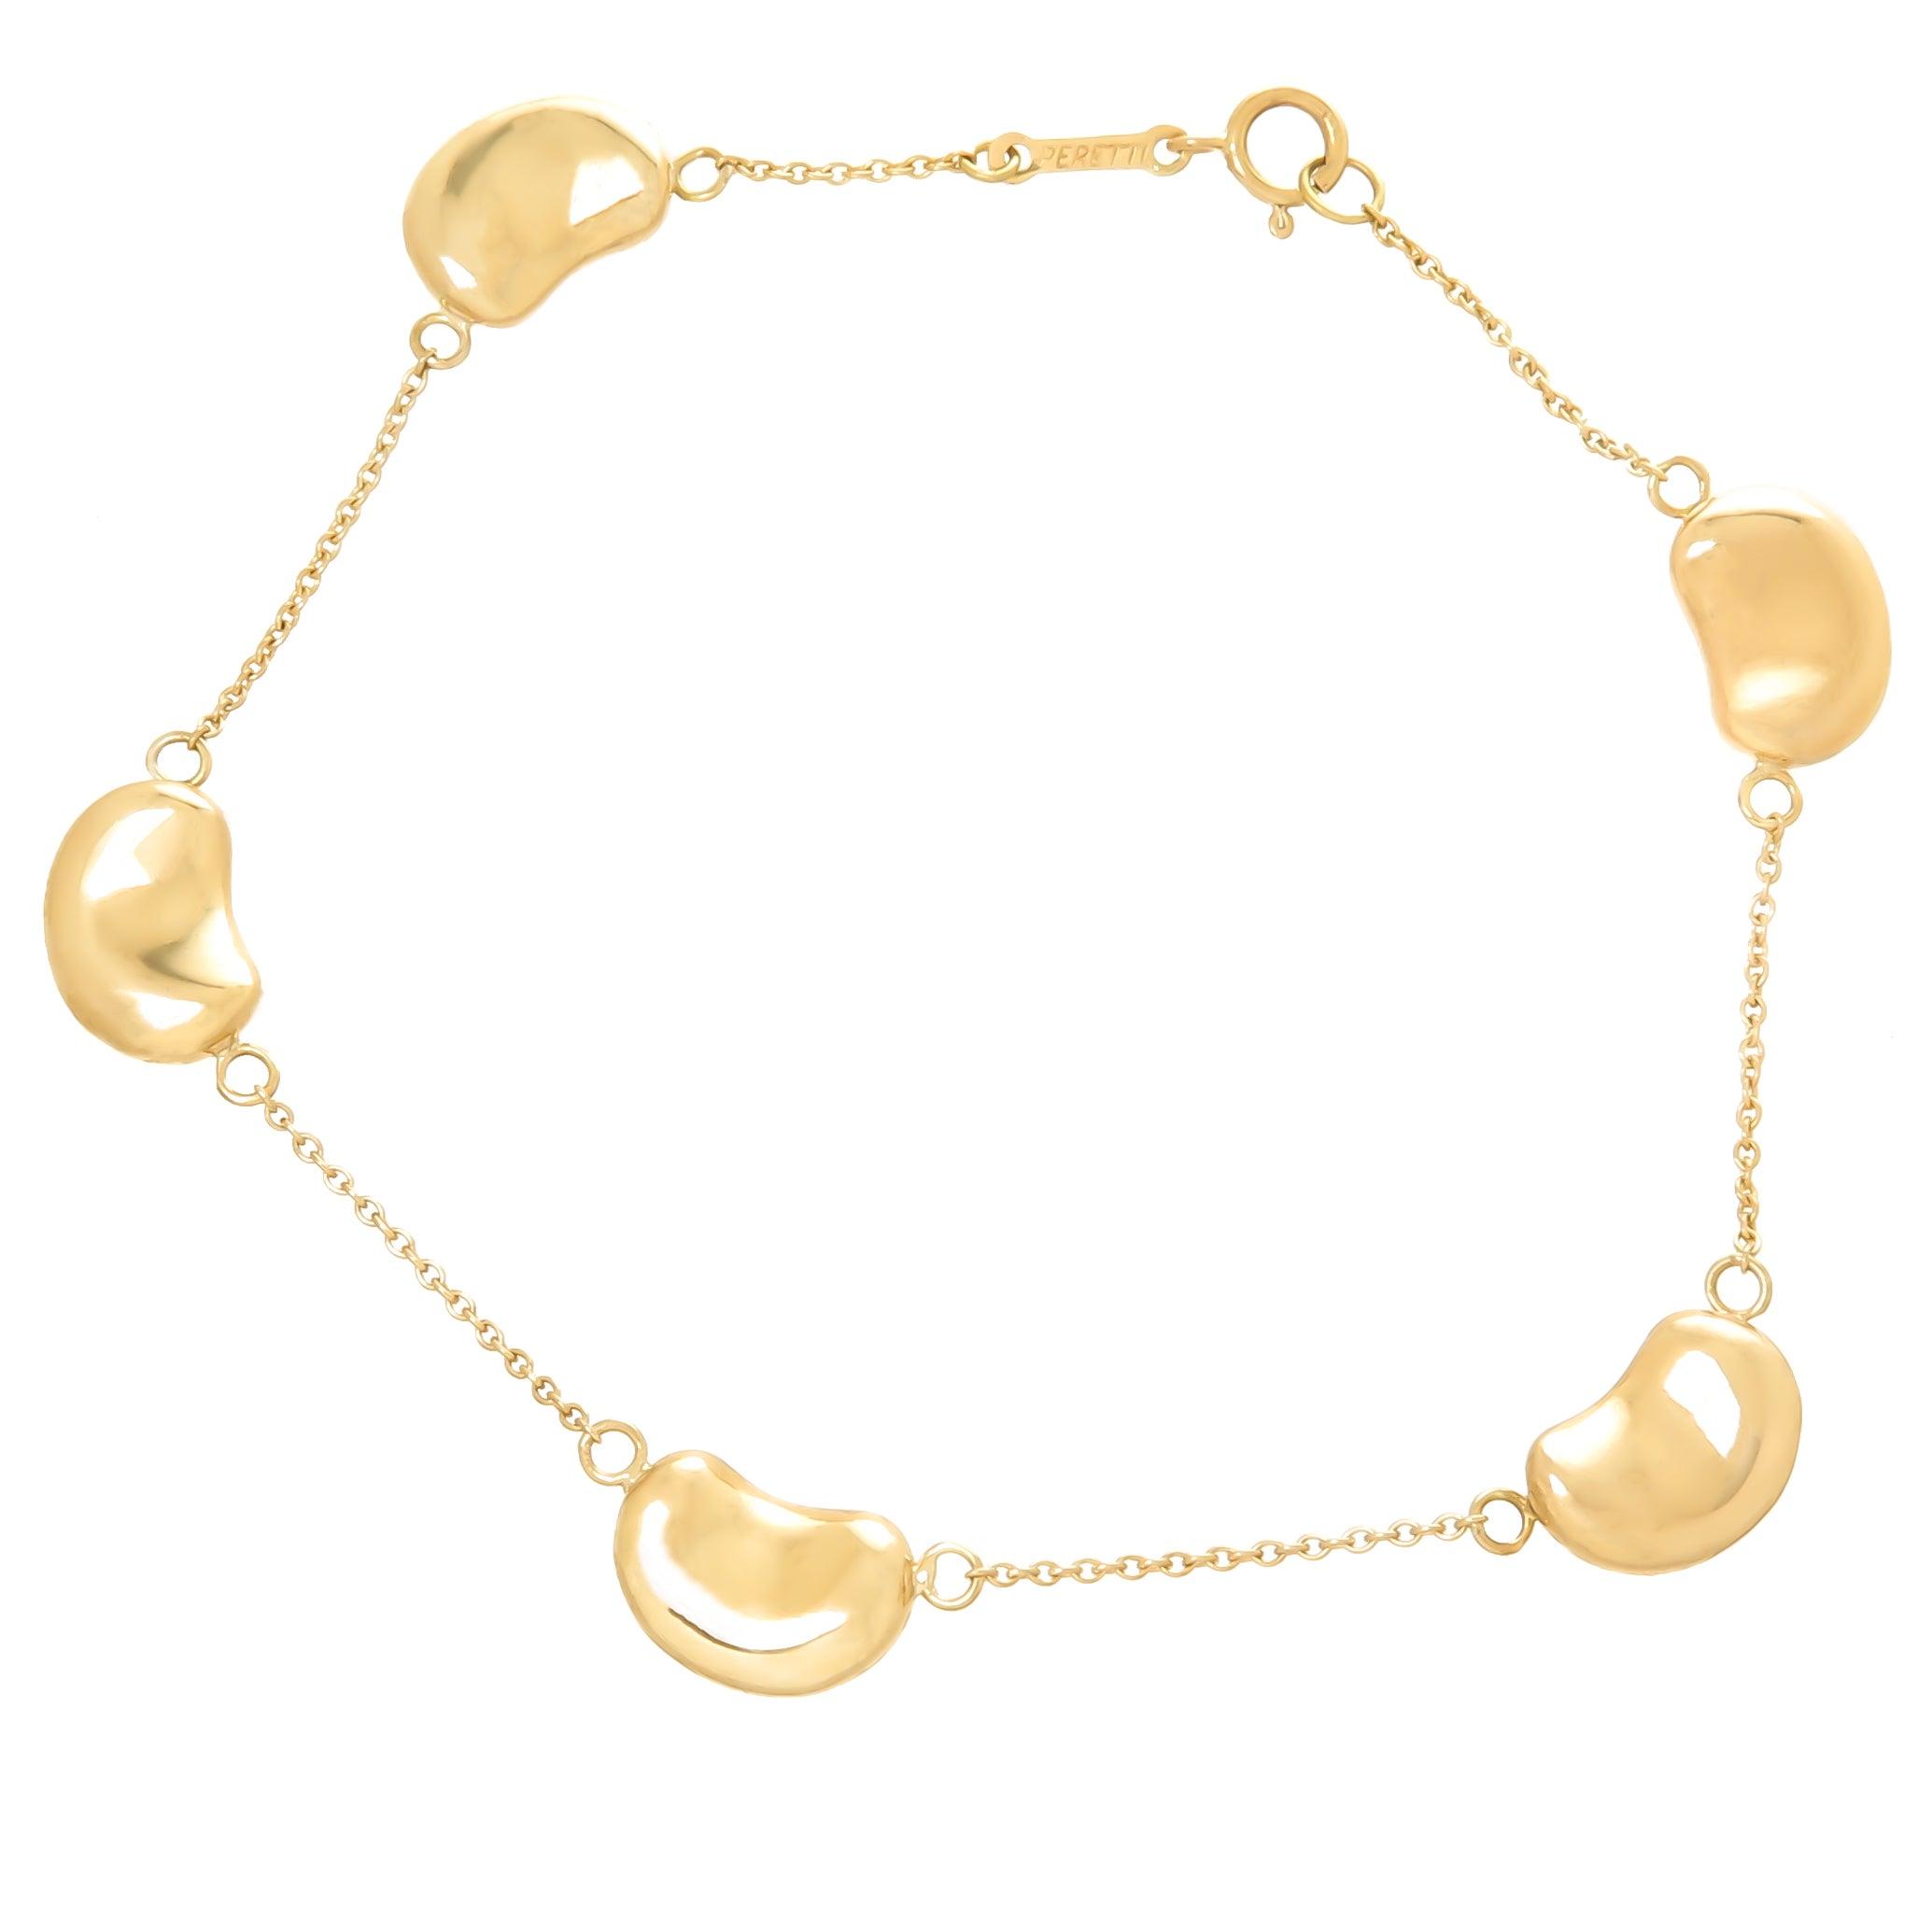 4bad33e0a49db Tiffany & Co. Elsa Peretti Yellow Gold Bean Bracelet